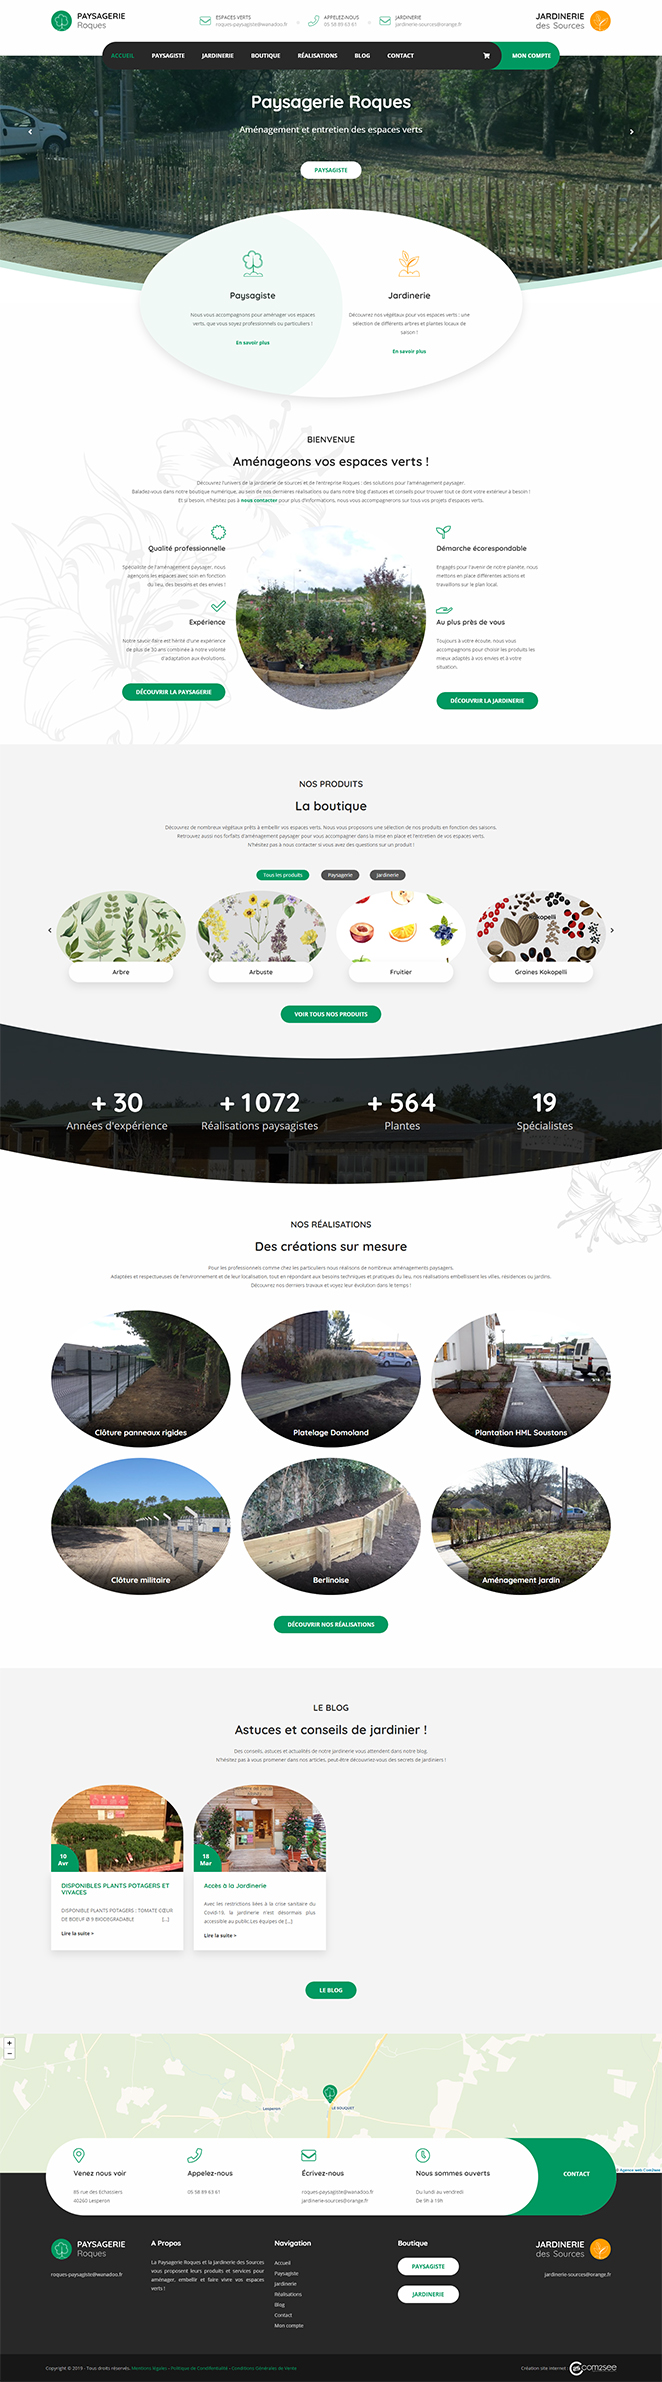 Site internet : Paysagiste – Jardinerie